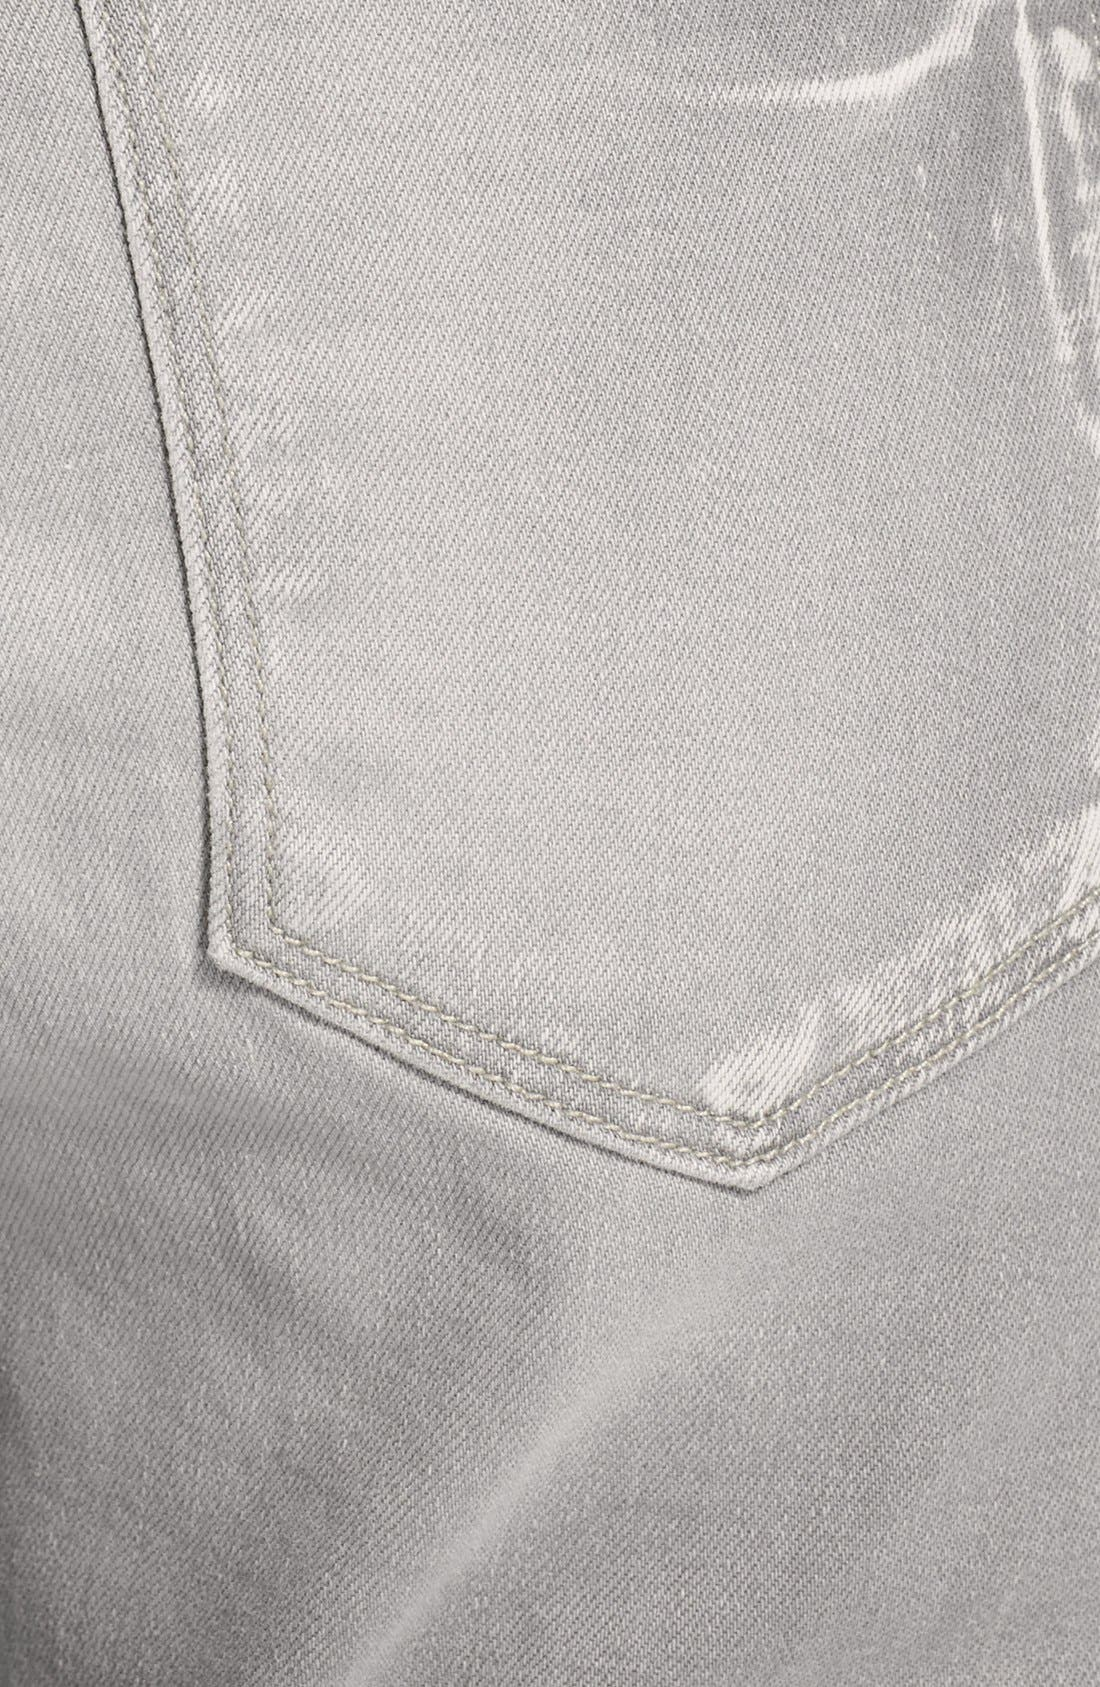 Alternate Image 3  - Frame Denim 'Le Garcon' Slim Boyfriend Jeans (Kensington)